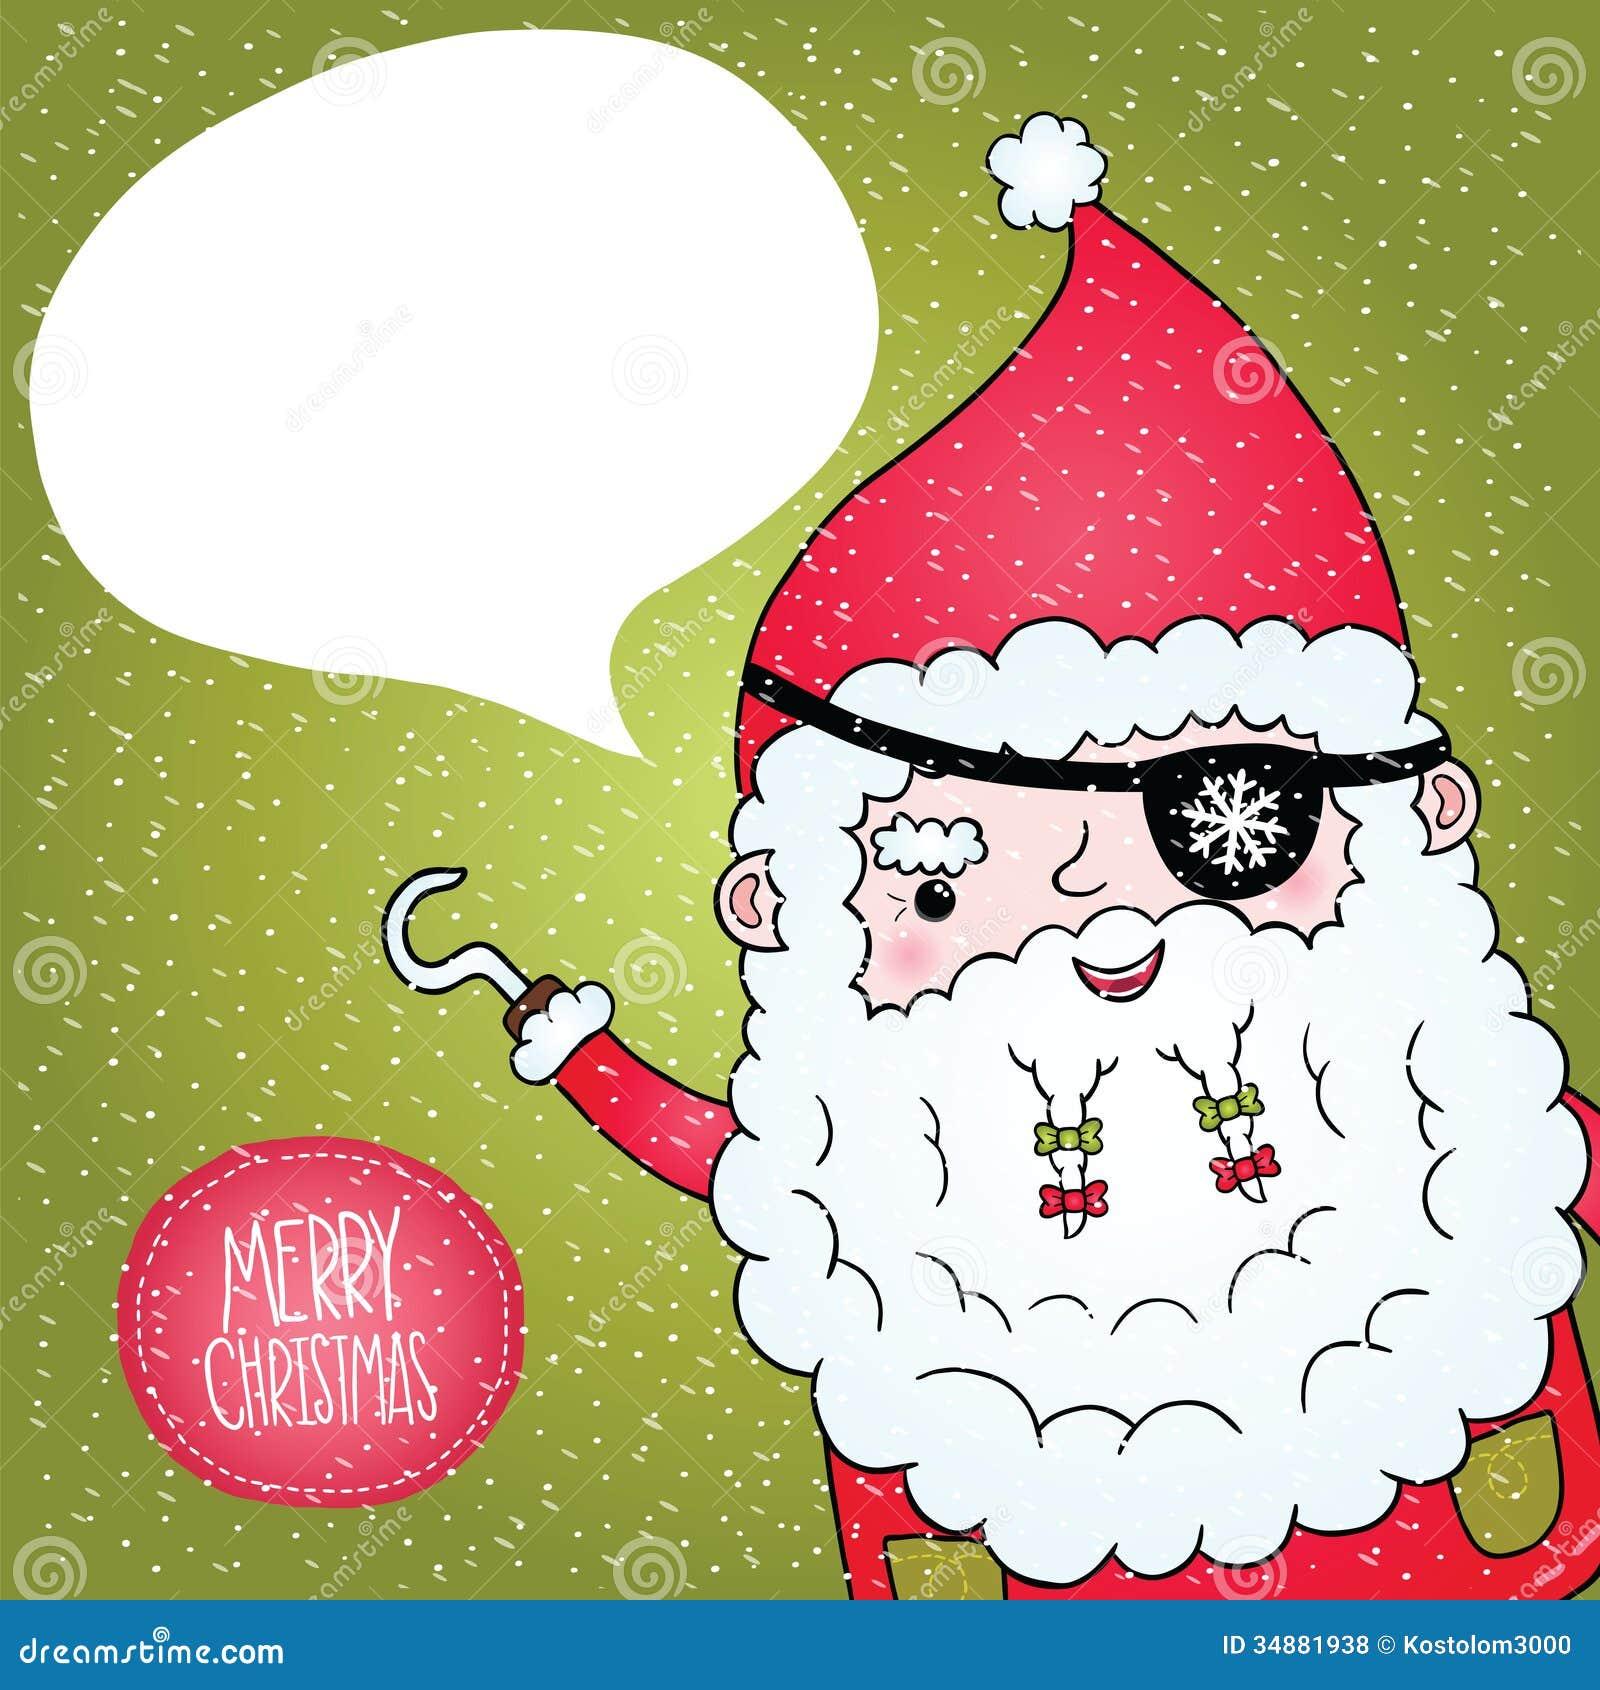 Santa Claus Pirate Poster